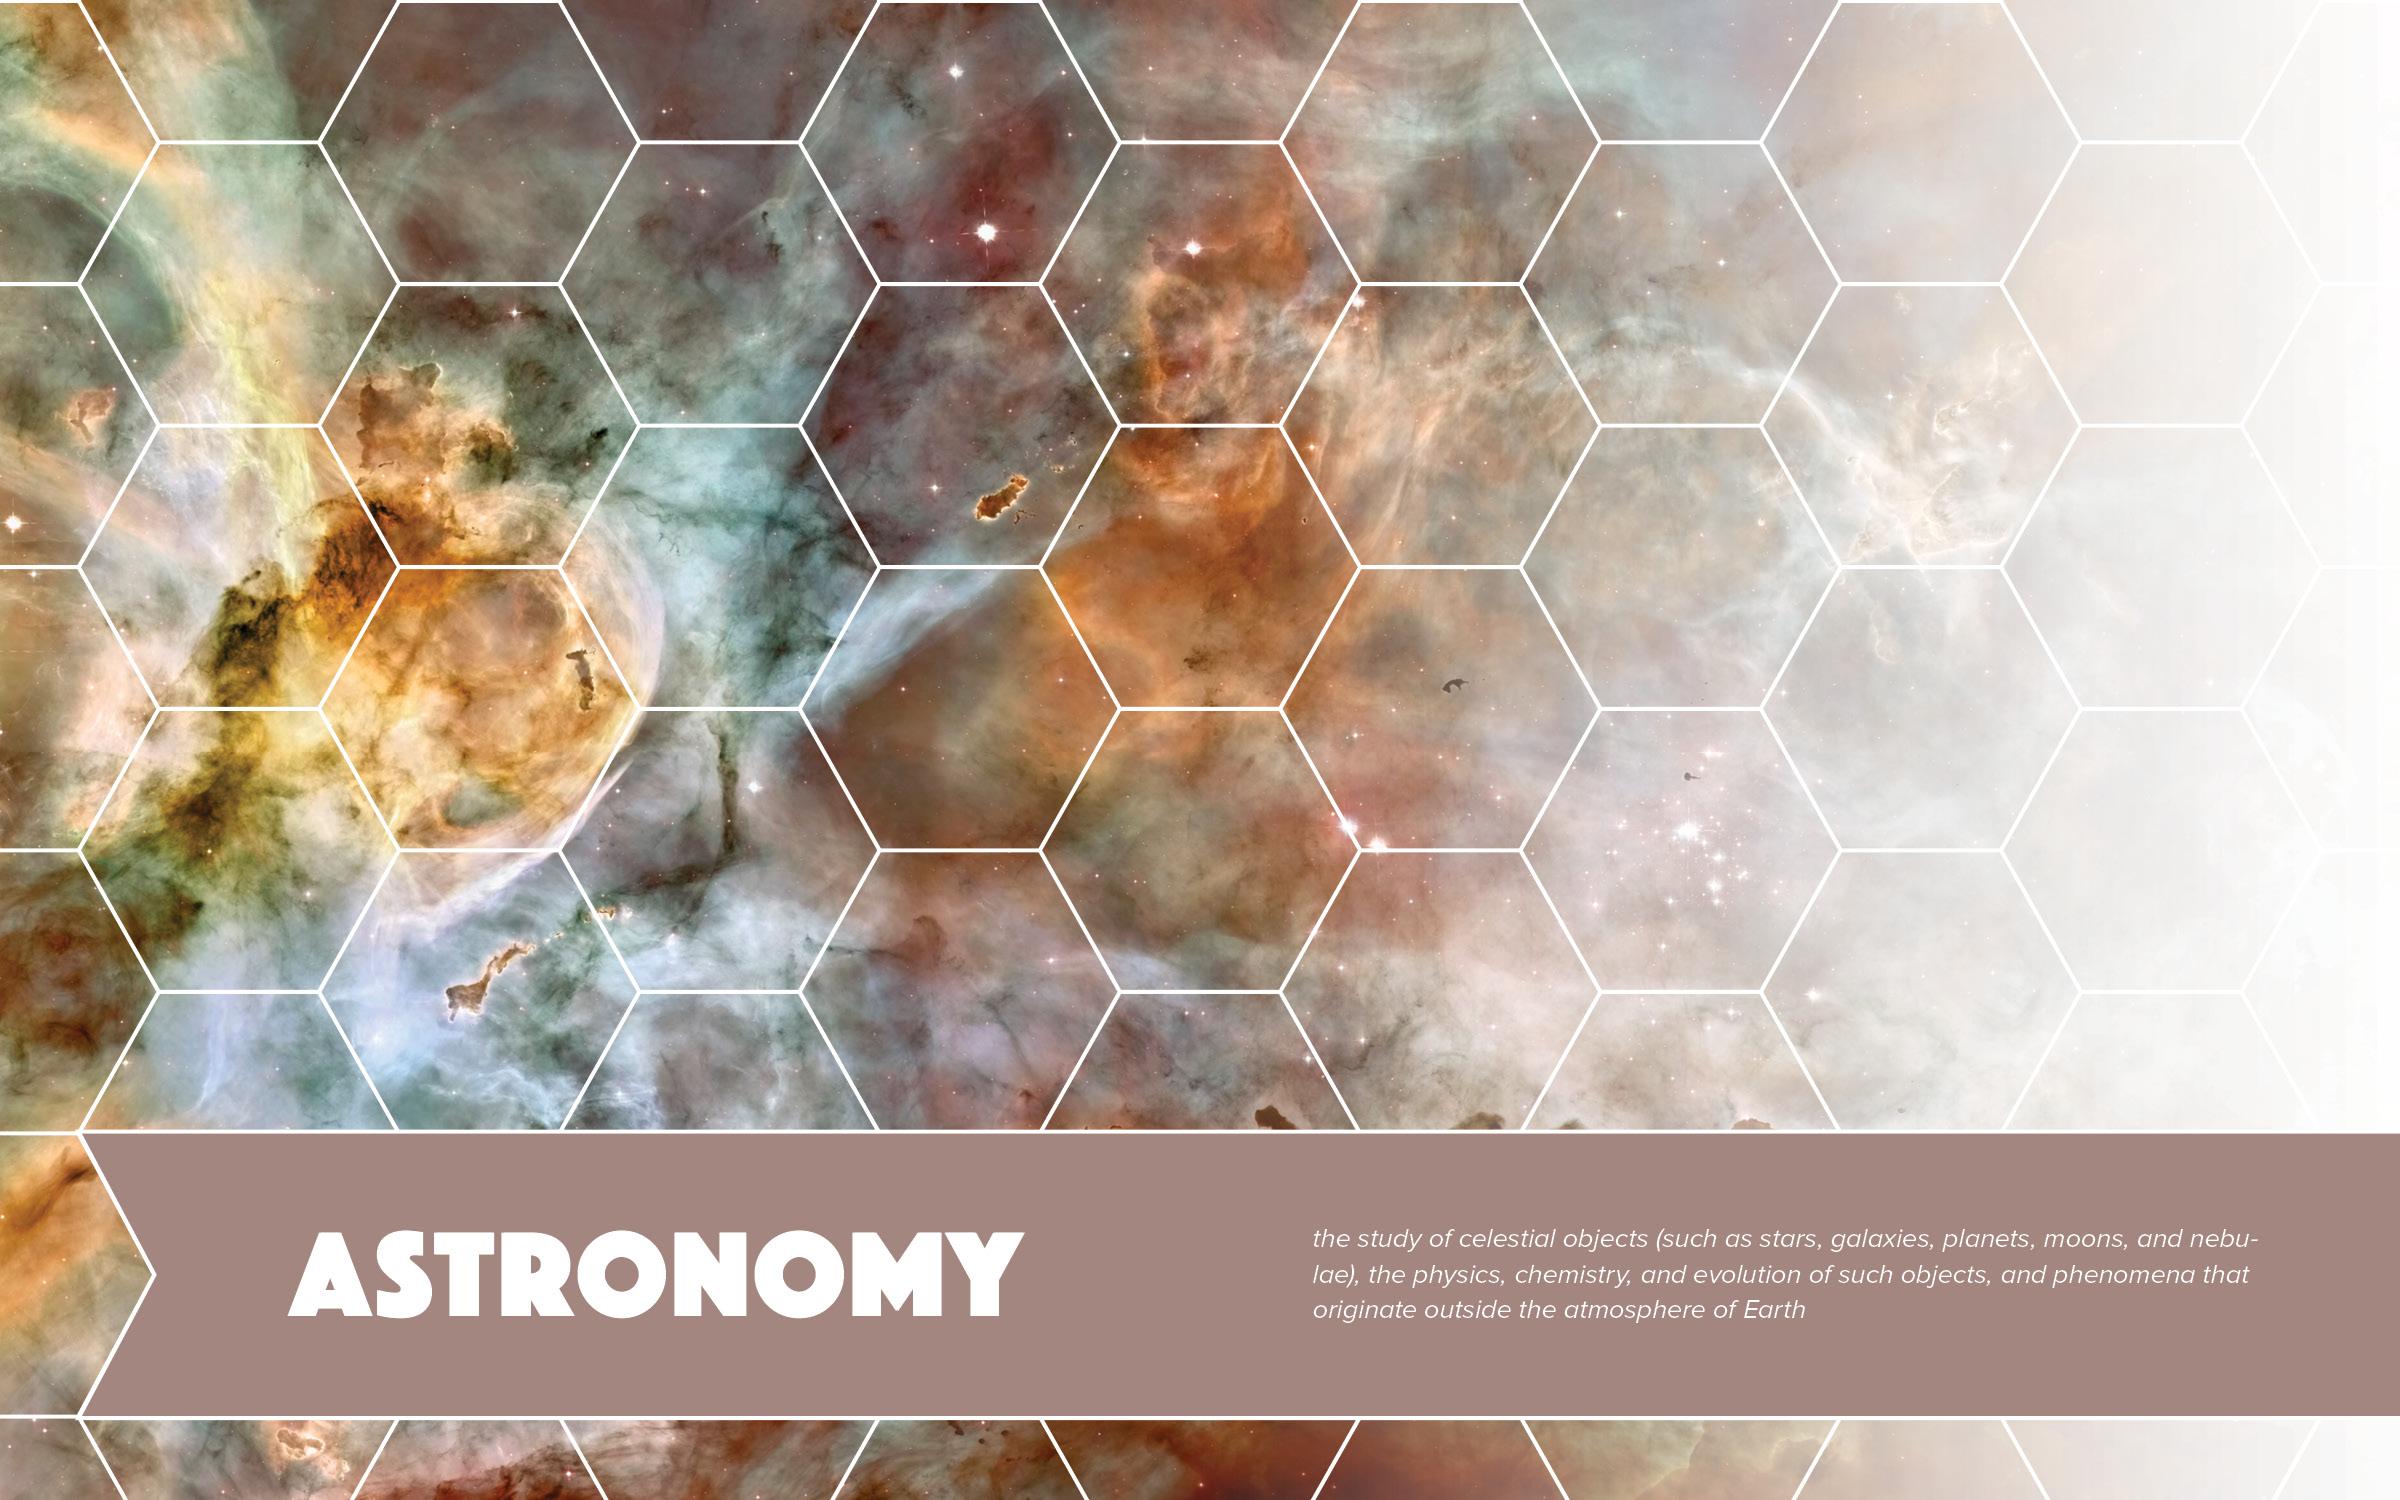 Astronomy.jpg